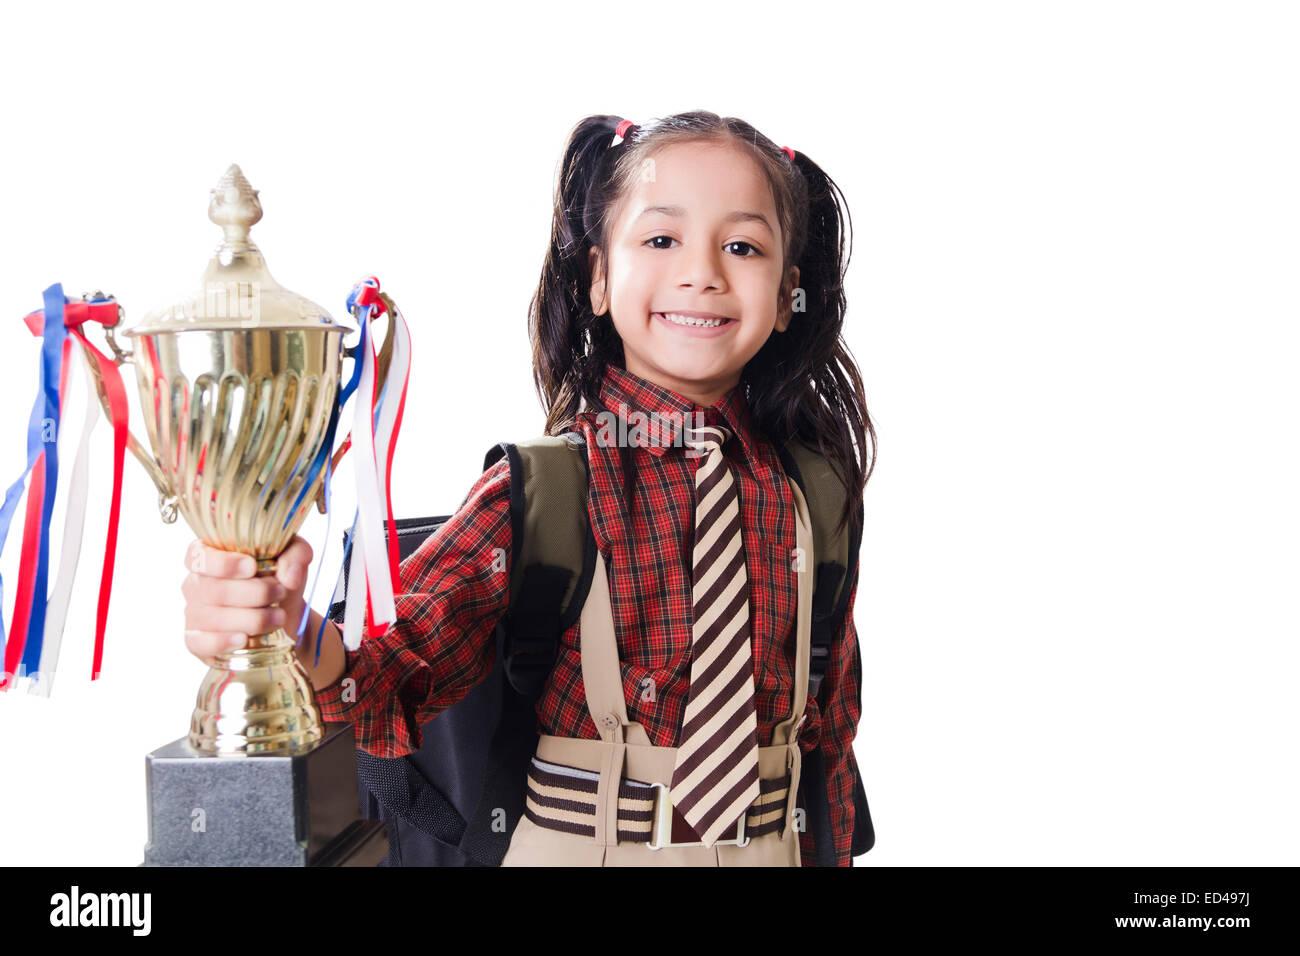 Young Indian School Girl Braids Stock Photos & Young